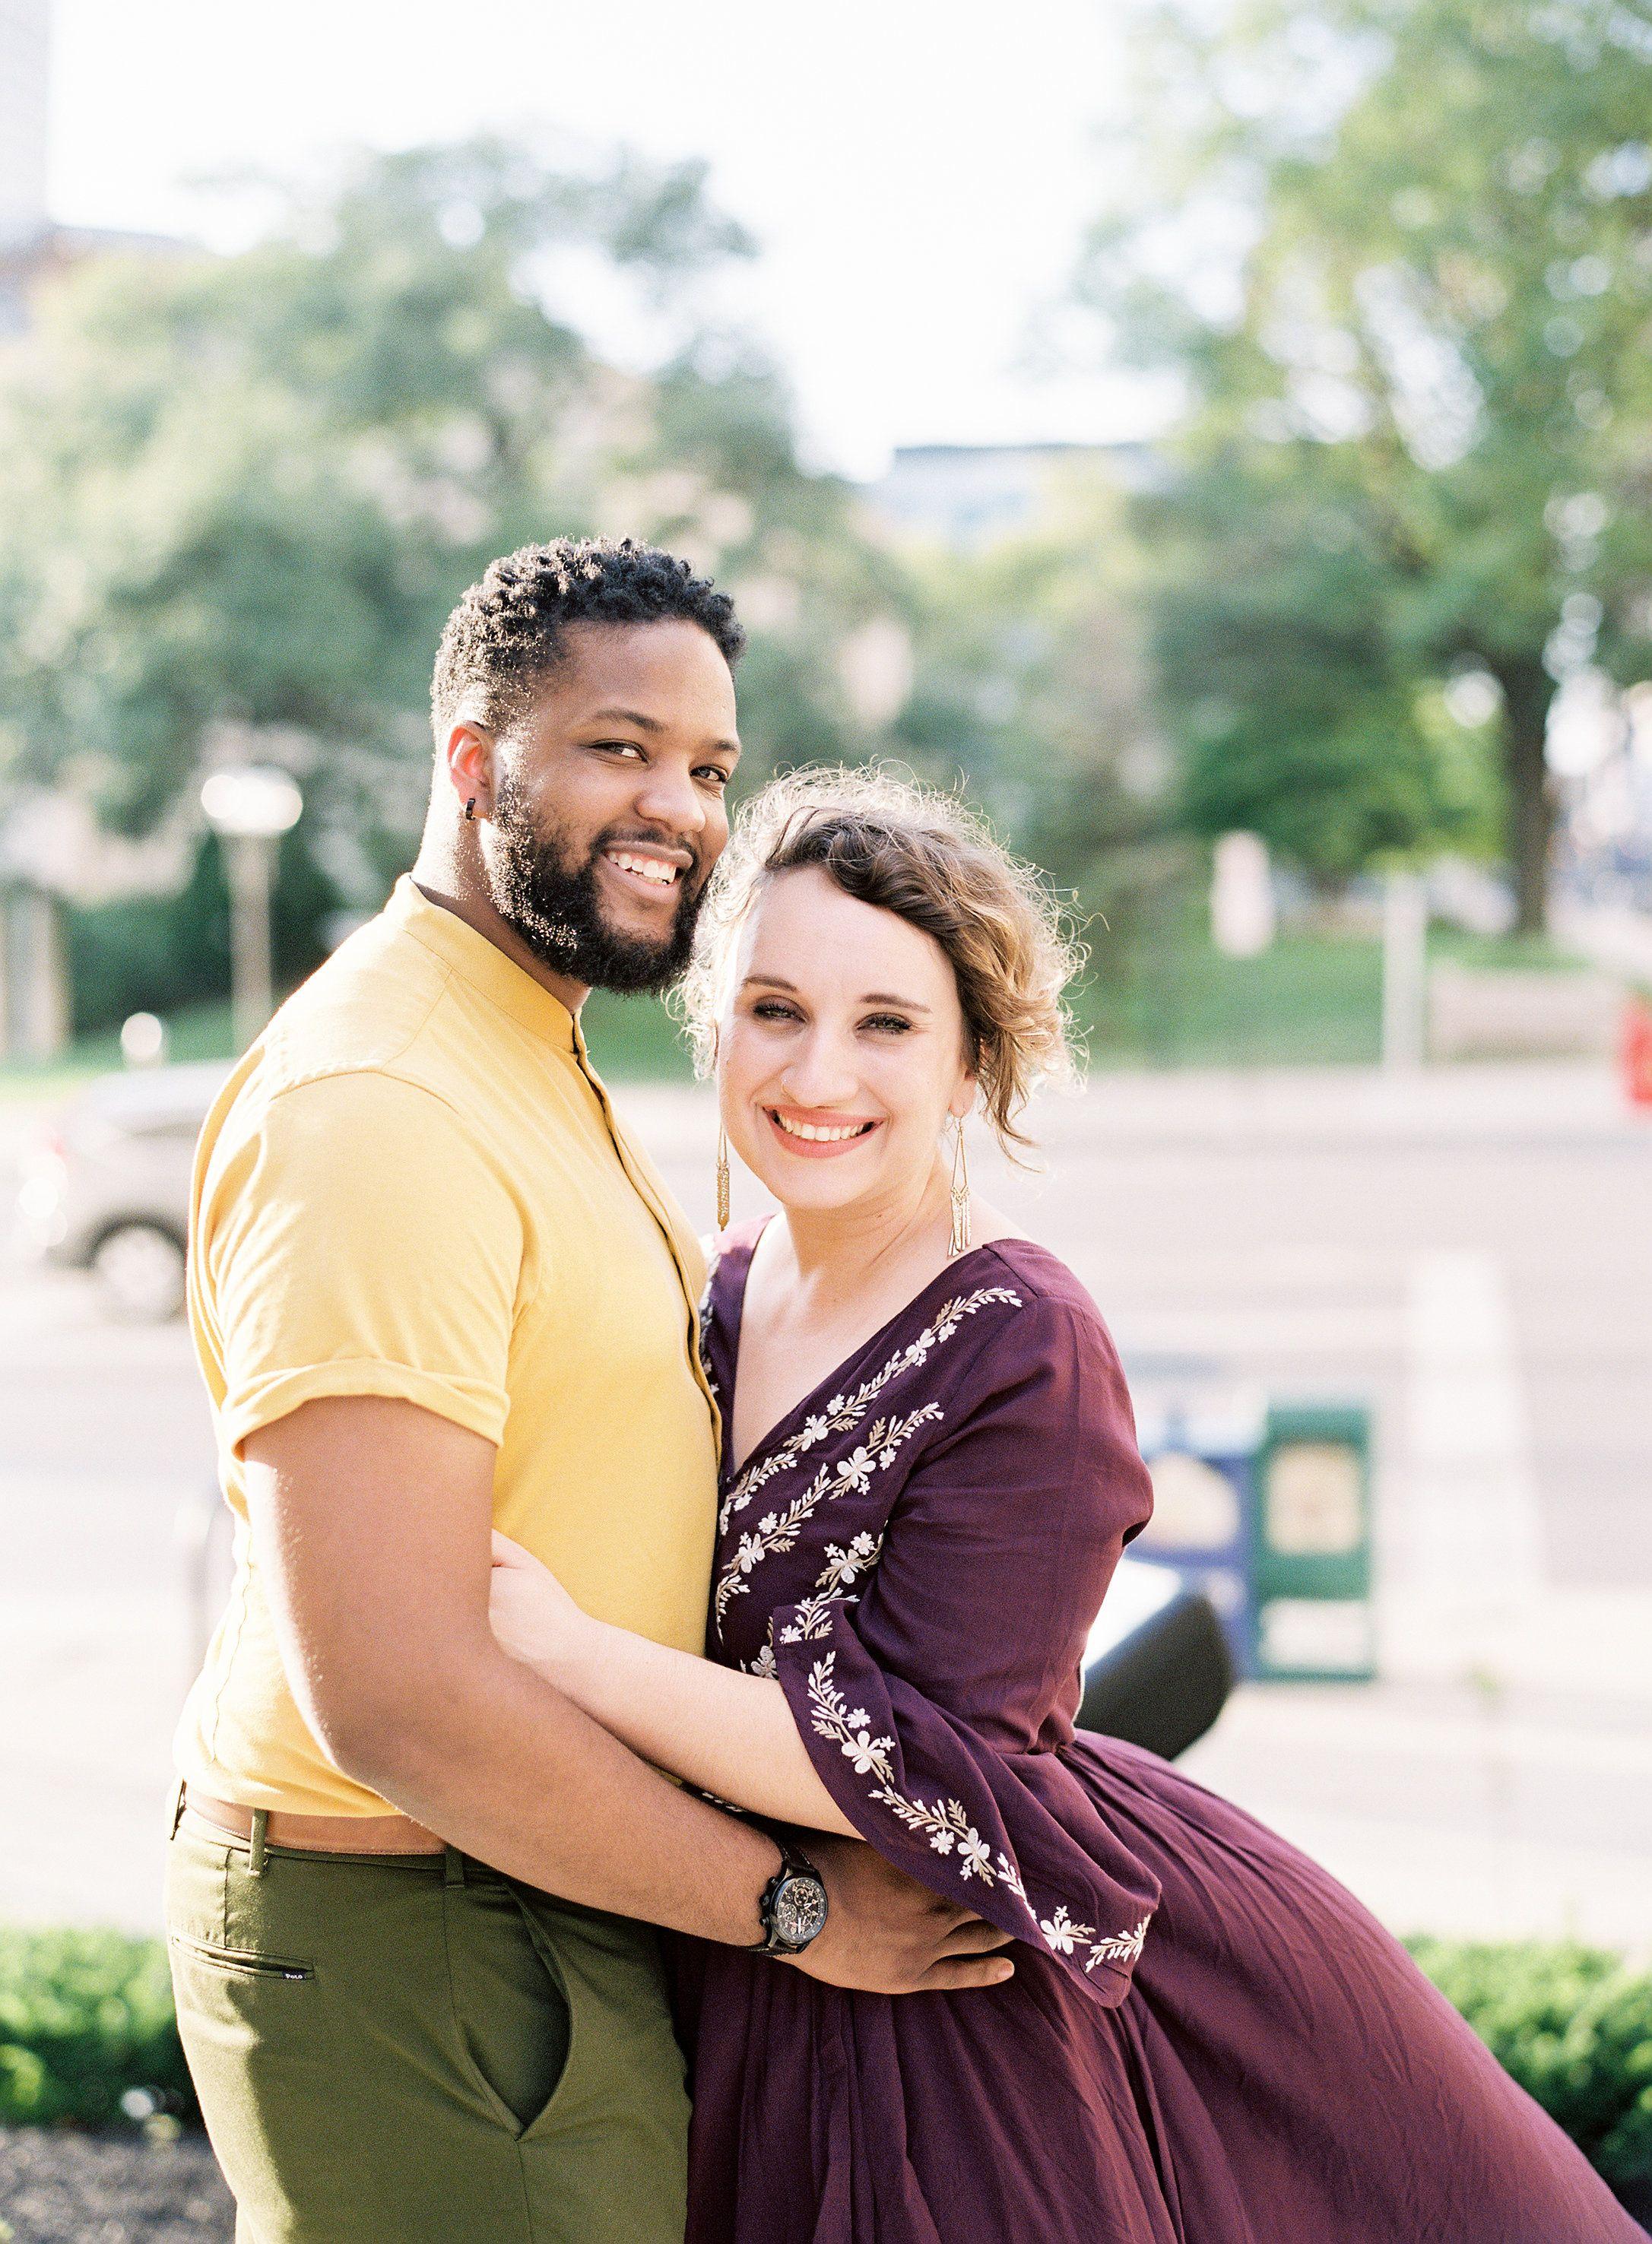 Interracial dating Midwest dating Fair Jaarbeurs Utrecht